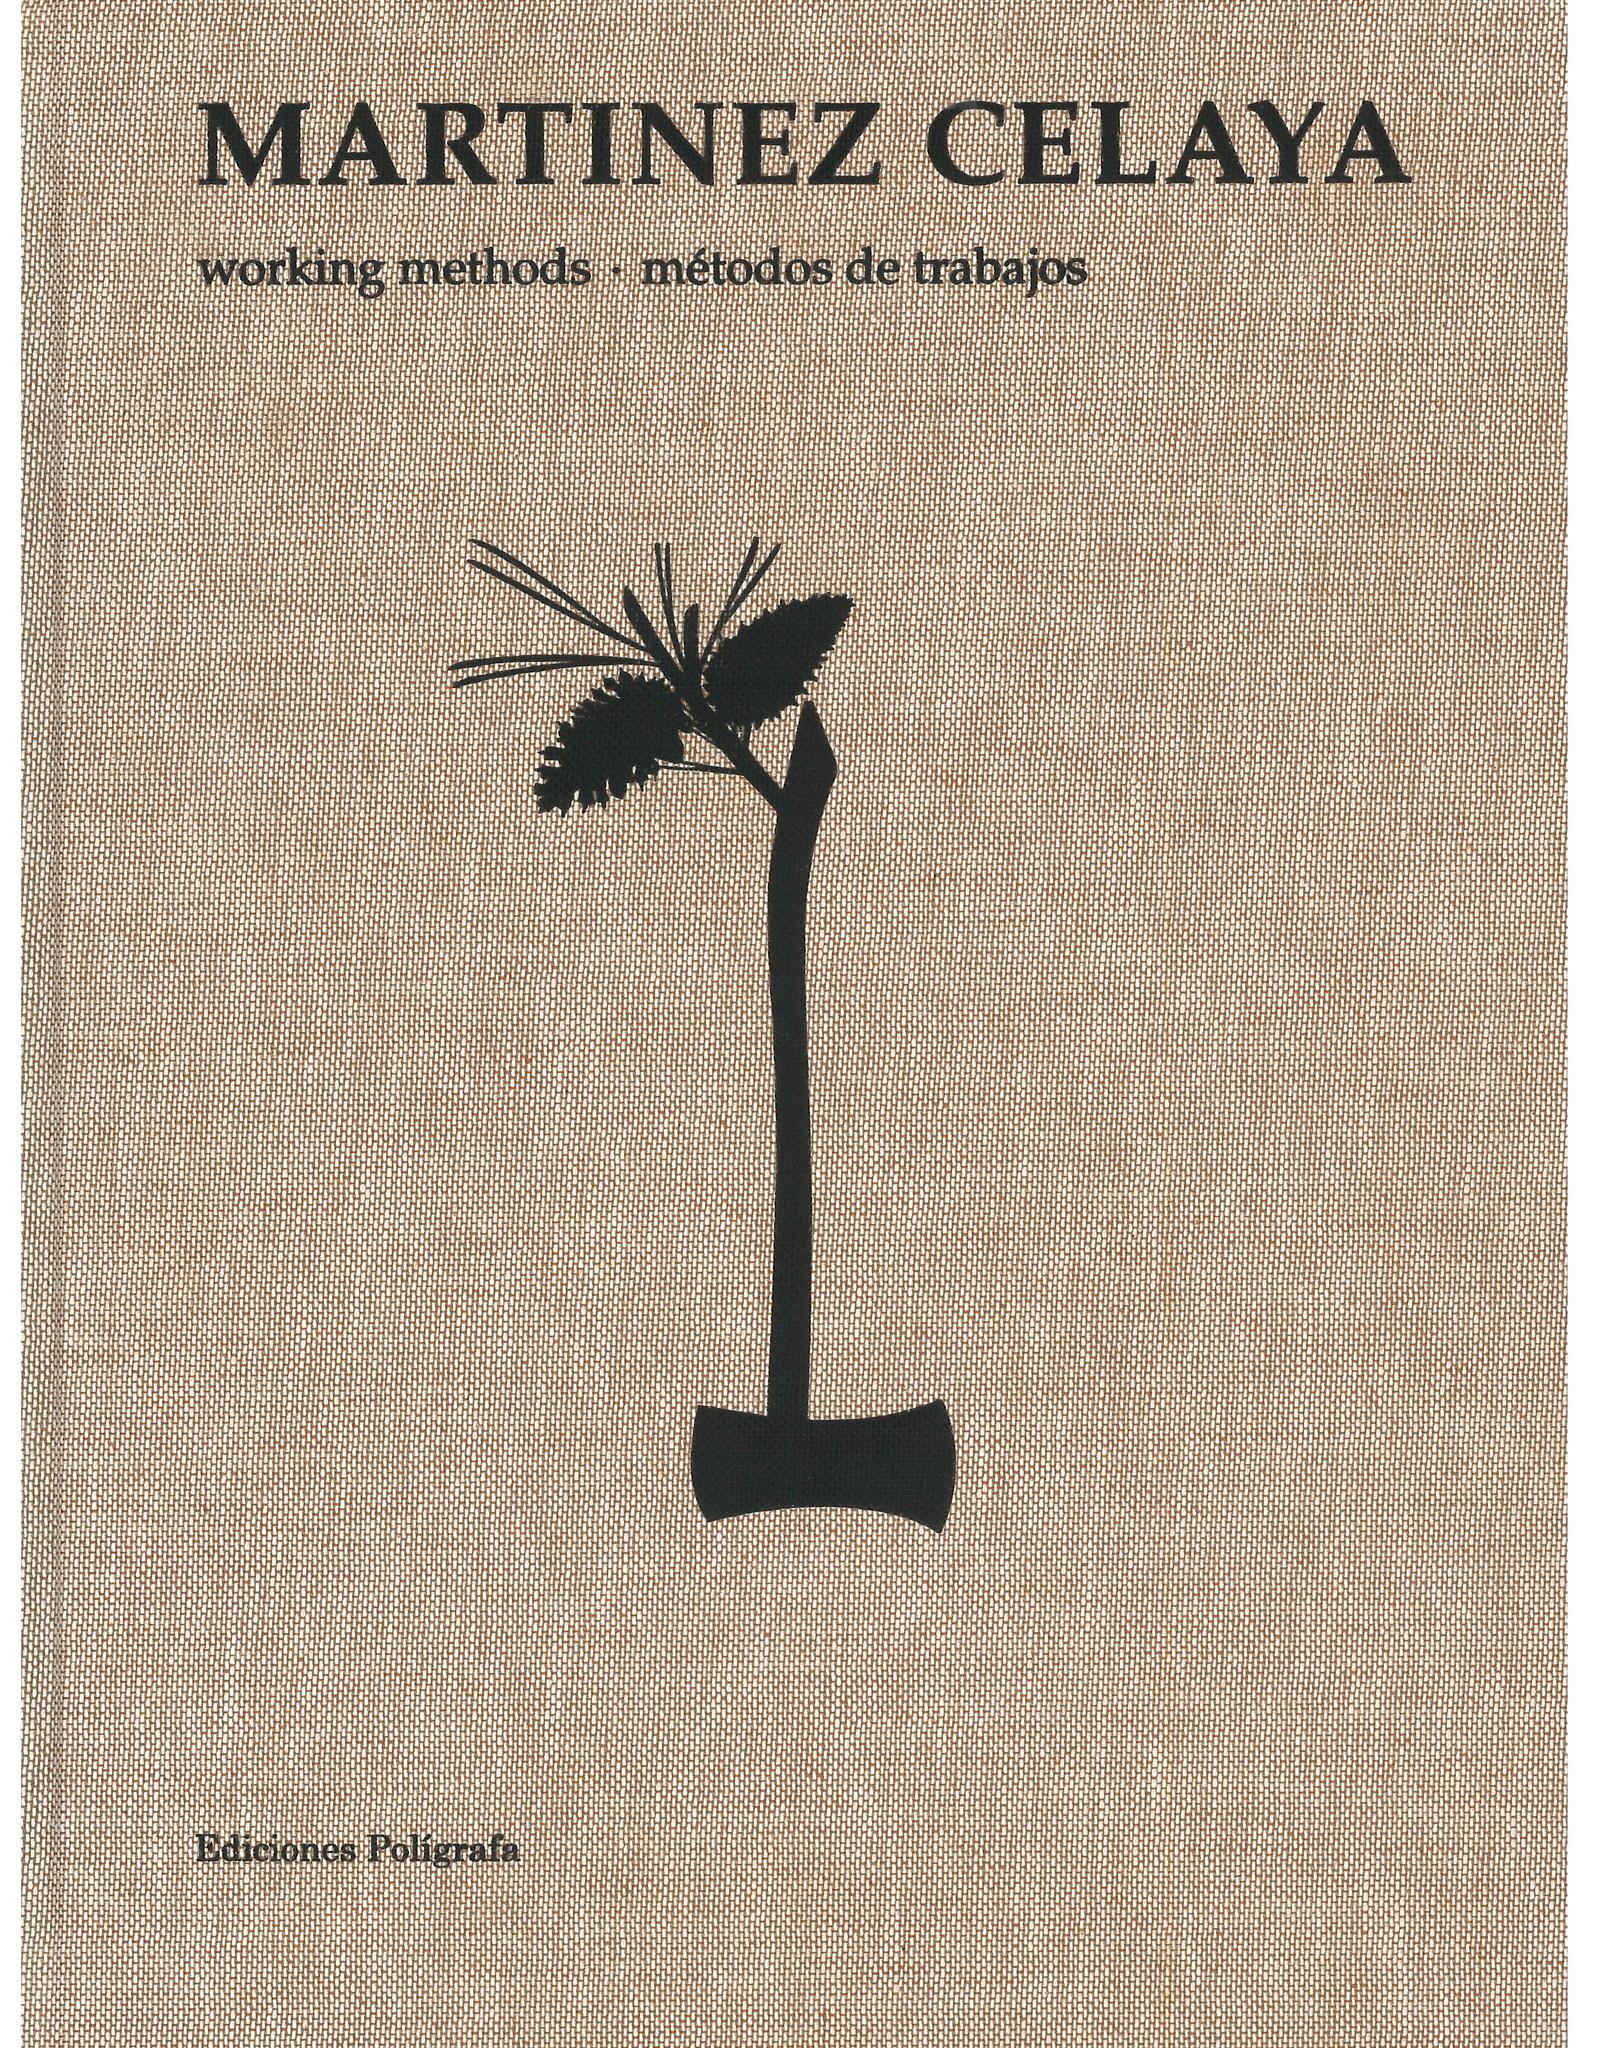 Working Methods Poligrafa / Enrique Martinez Celaya